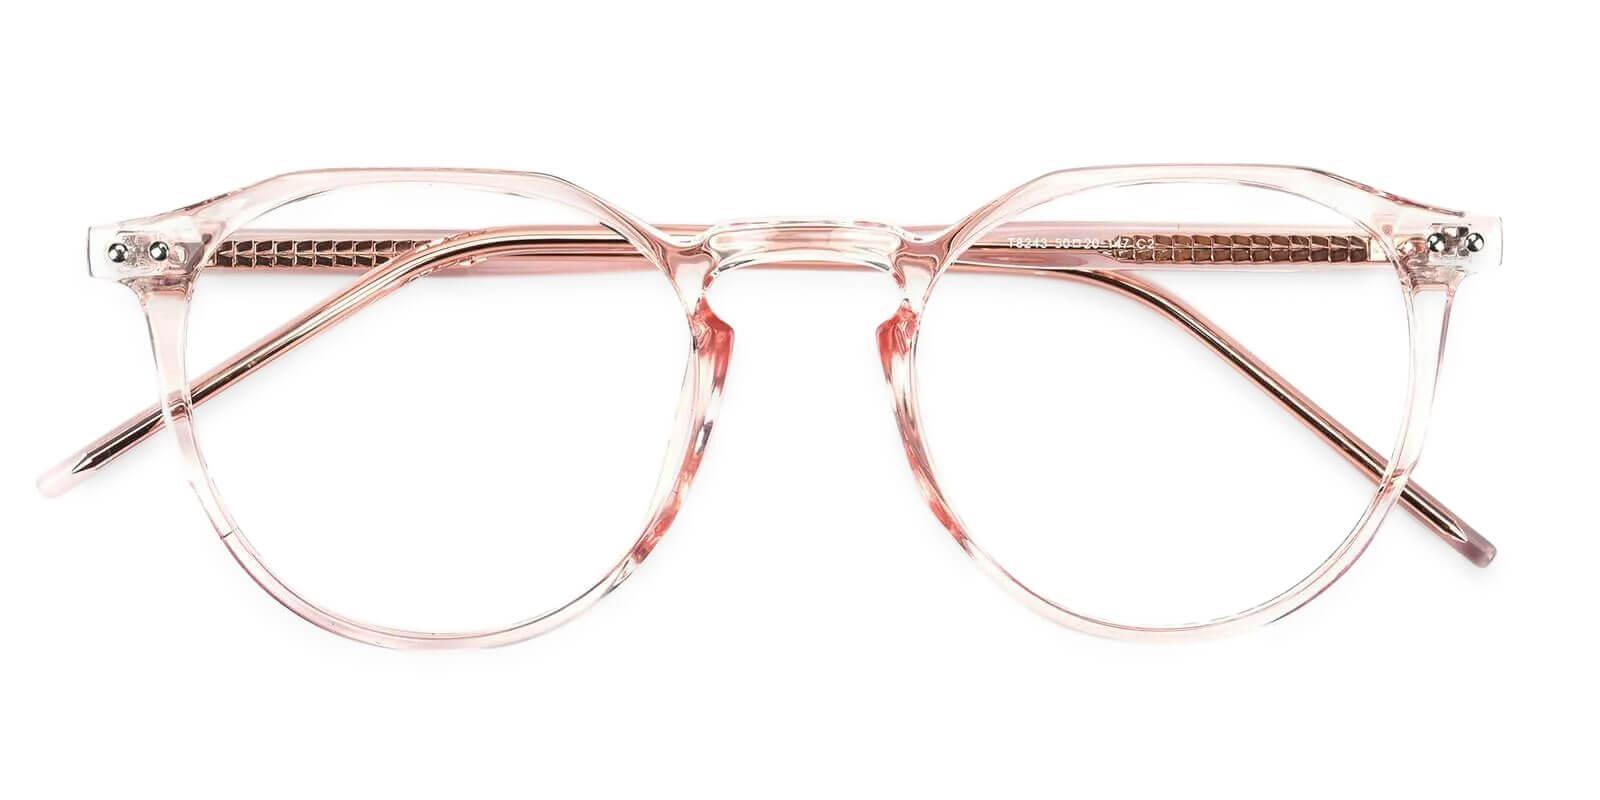 Mariner Pink Acetate Eyeglasses , SpringHinges , UniversalBridgeFit Frames from ABBE Glasses